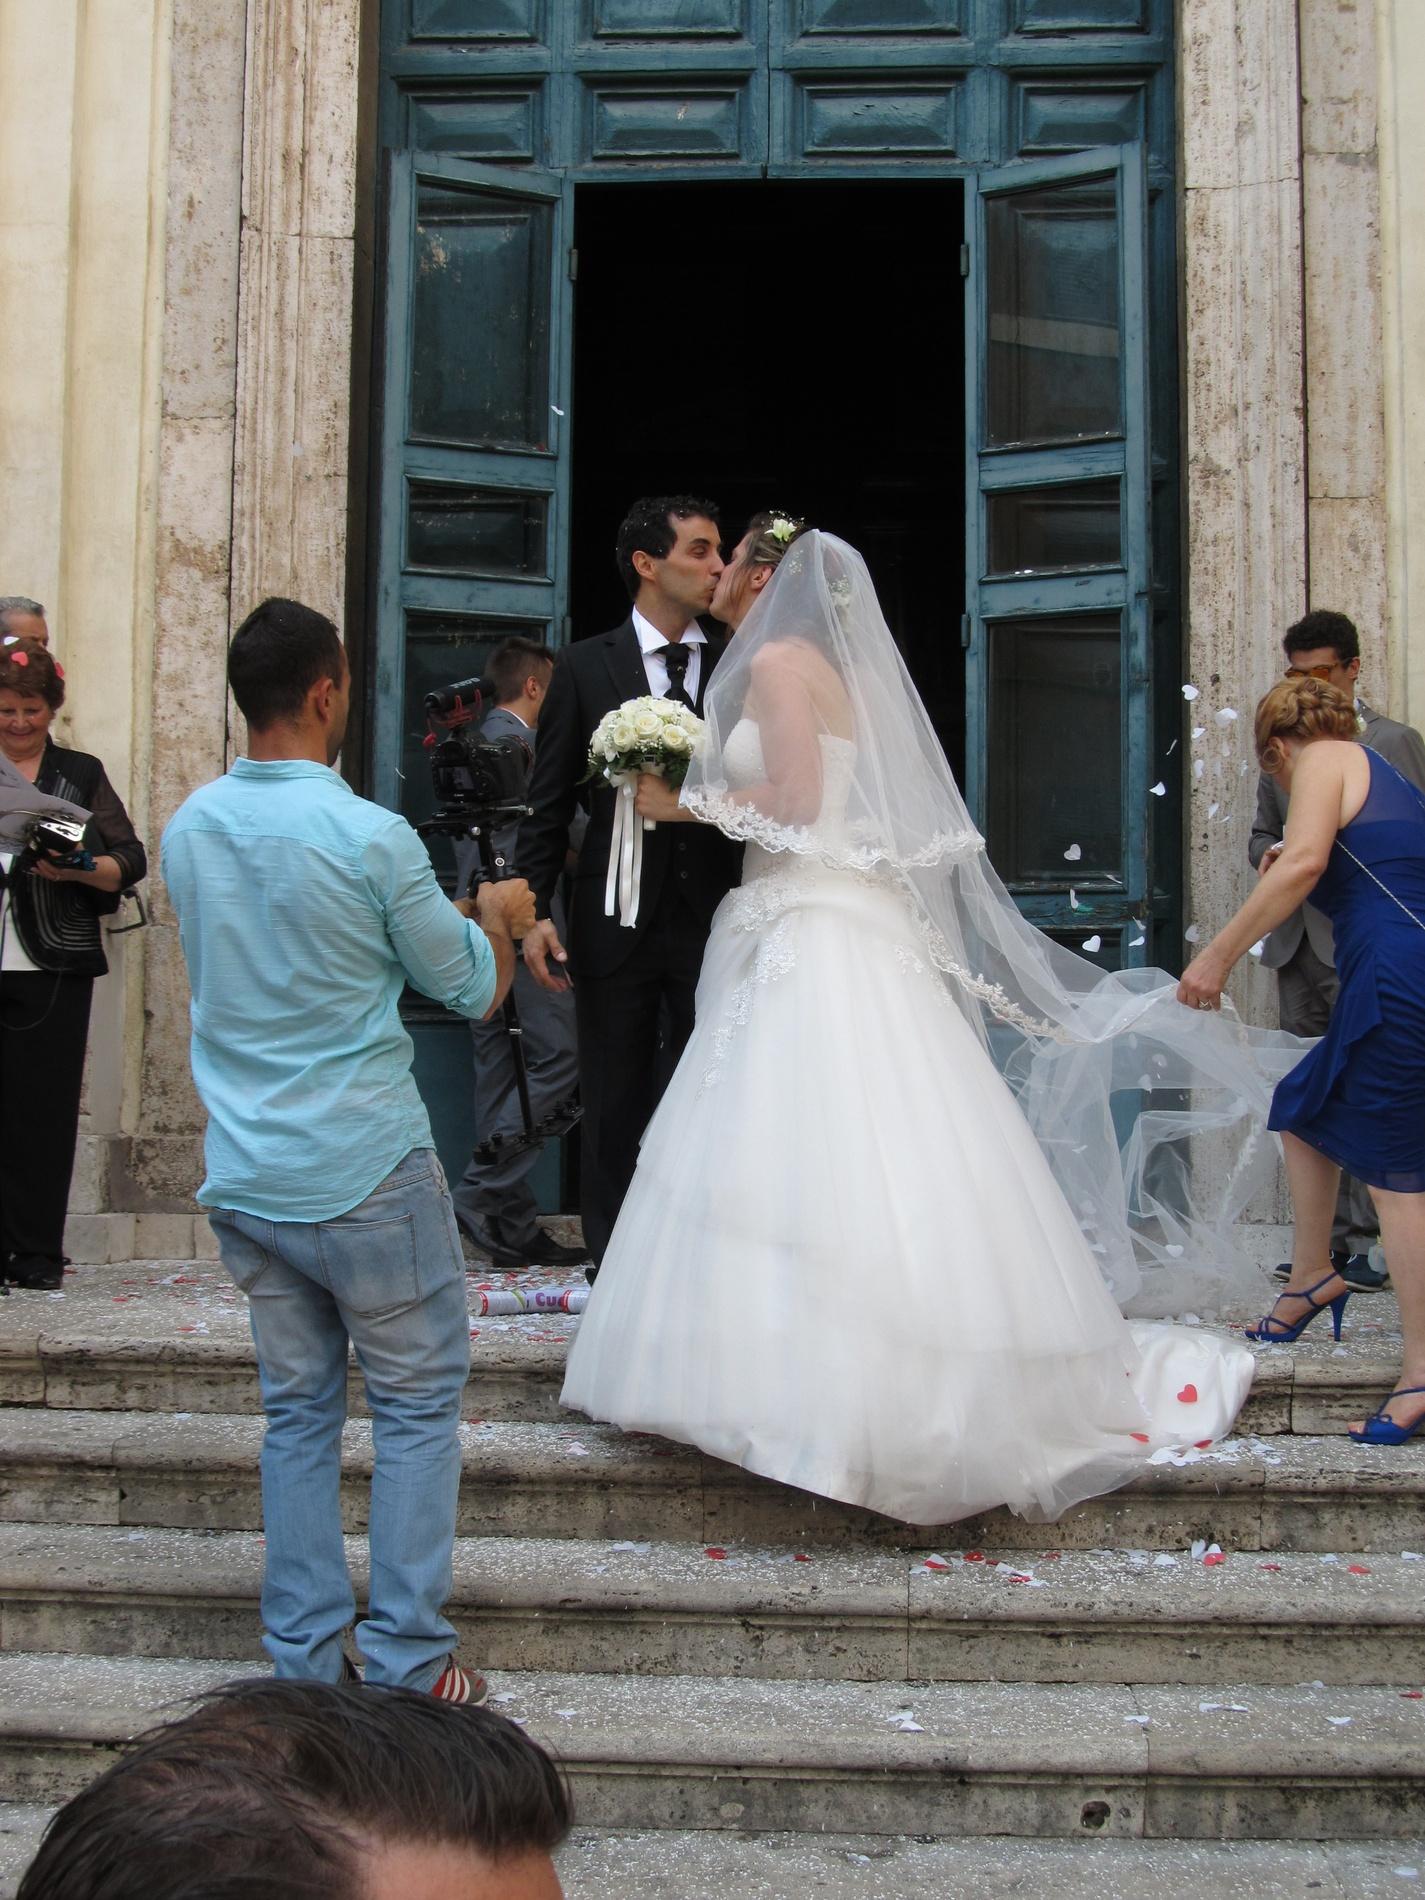 matrimonio-ilaria-torrisi-e-marco-di-lucia-2015-08-08-16-52-47